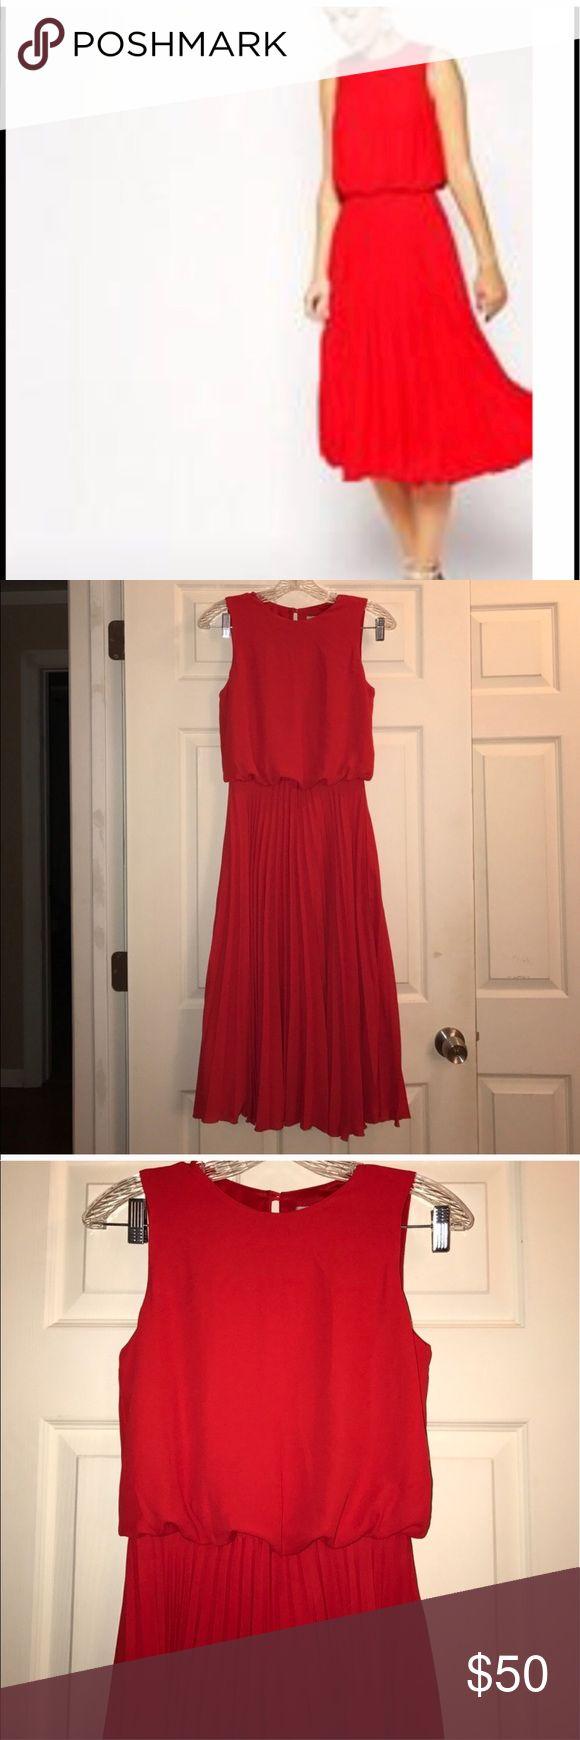 ASOS red dress So cuteness just isn't my color Asos Dresses Midi